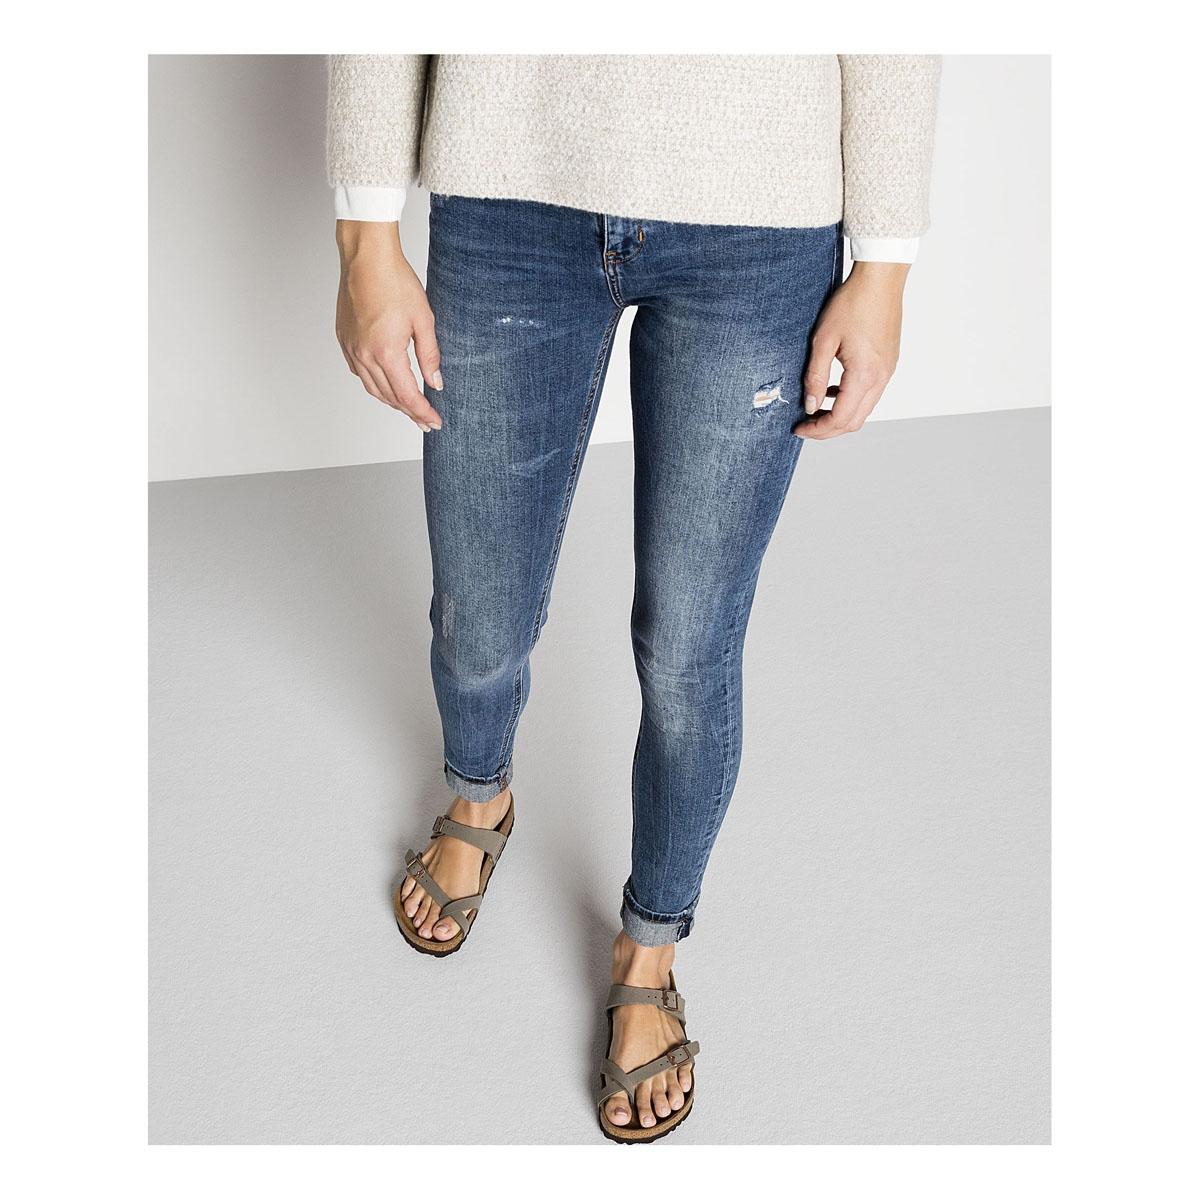 0100787f2b8d7 ... Image of Birkenstock Mayari Birko-Flor Synthetic Leather Sandals  (Women s) - Stone ...